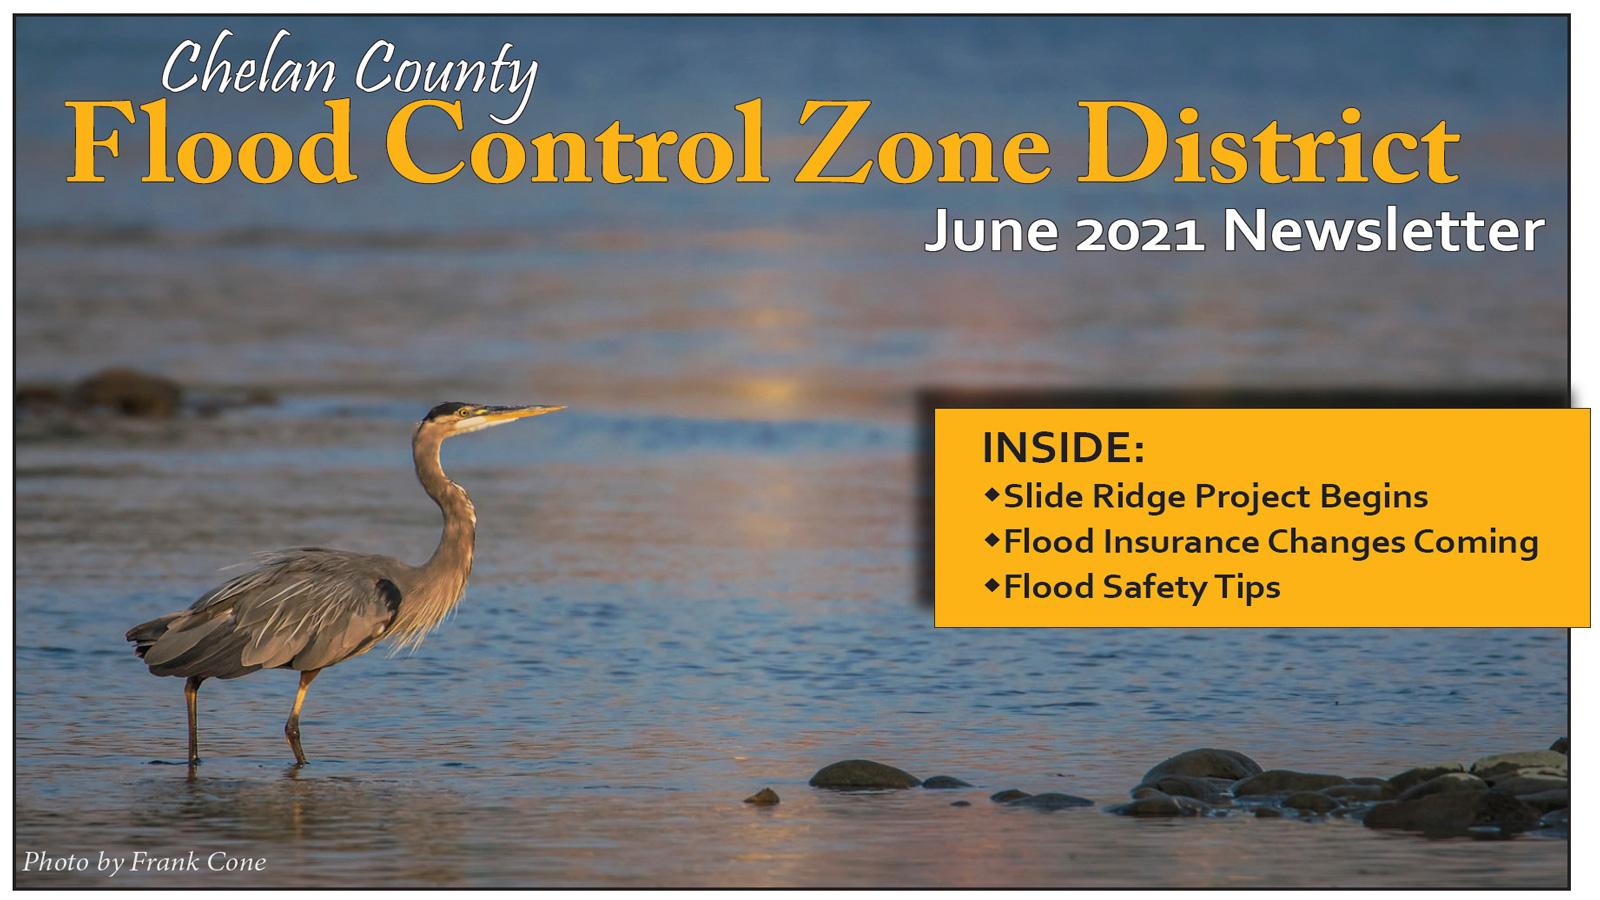 2021 Newsletter: FCZD steps into new era